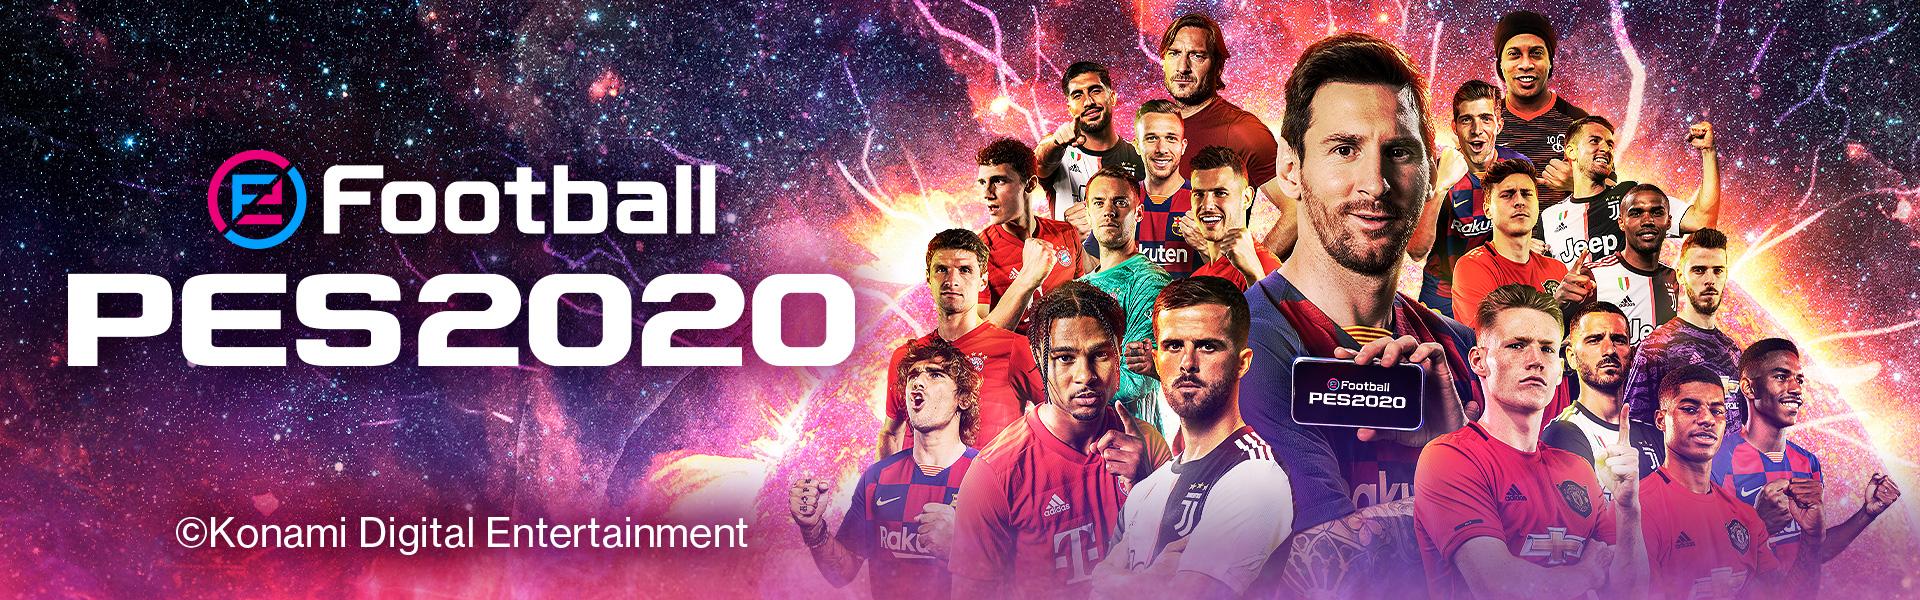 eFootball PES 2020 Mobile logo